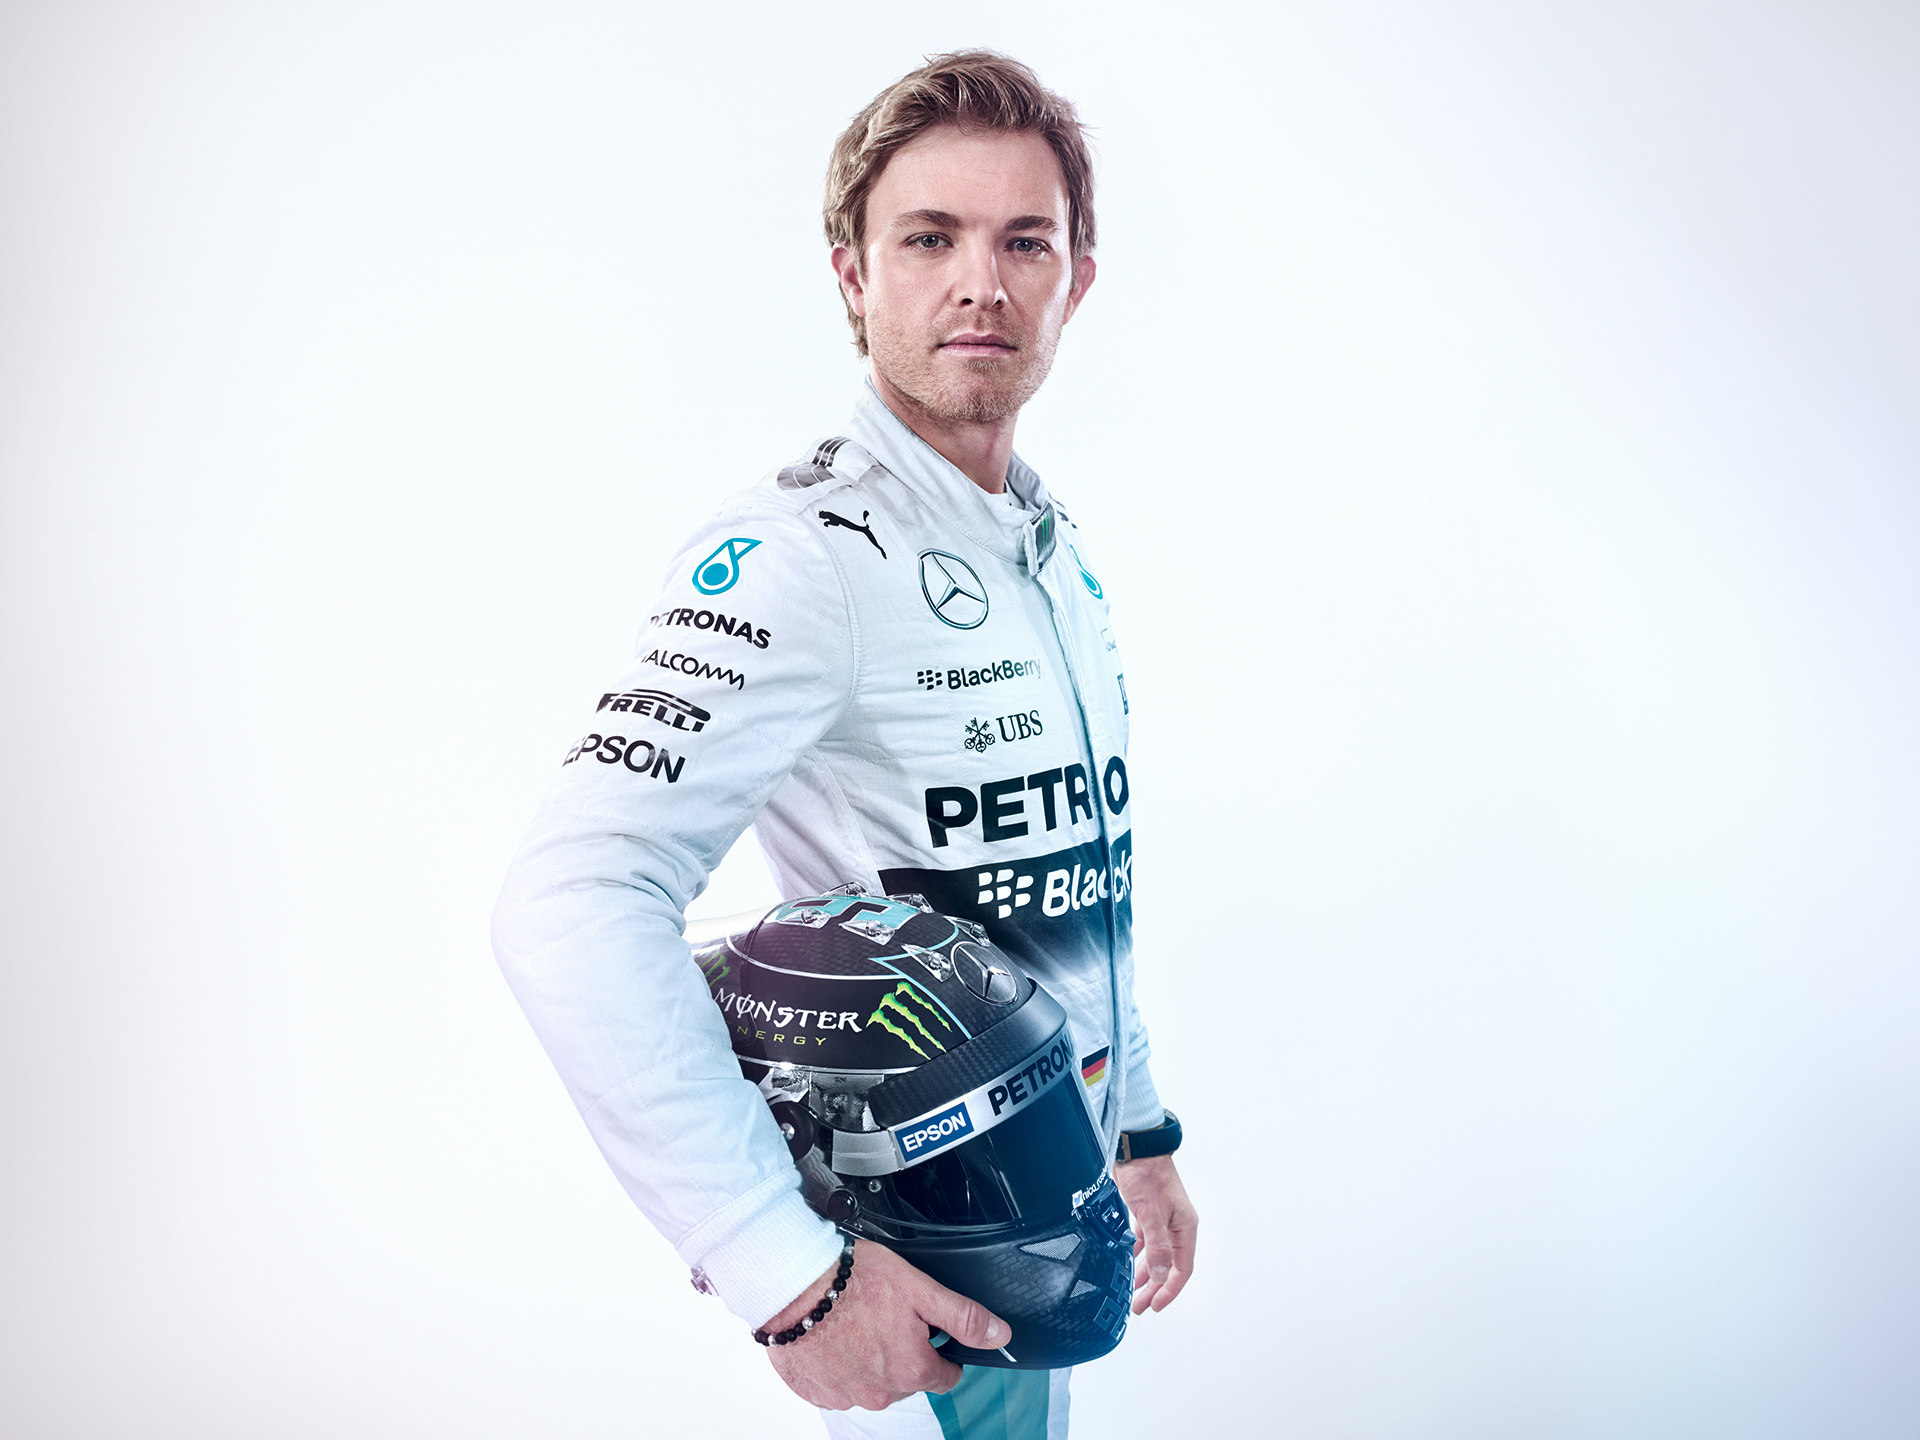 Anke Luckmann, www.ankeluckmann.com, trey, Mercedes Benz, Formel 1, F1, Barcelona, circuit de catalunya, spain, amg, nico rosberg